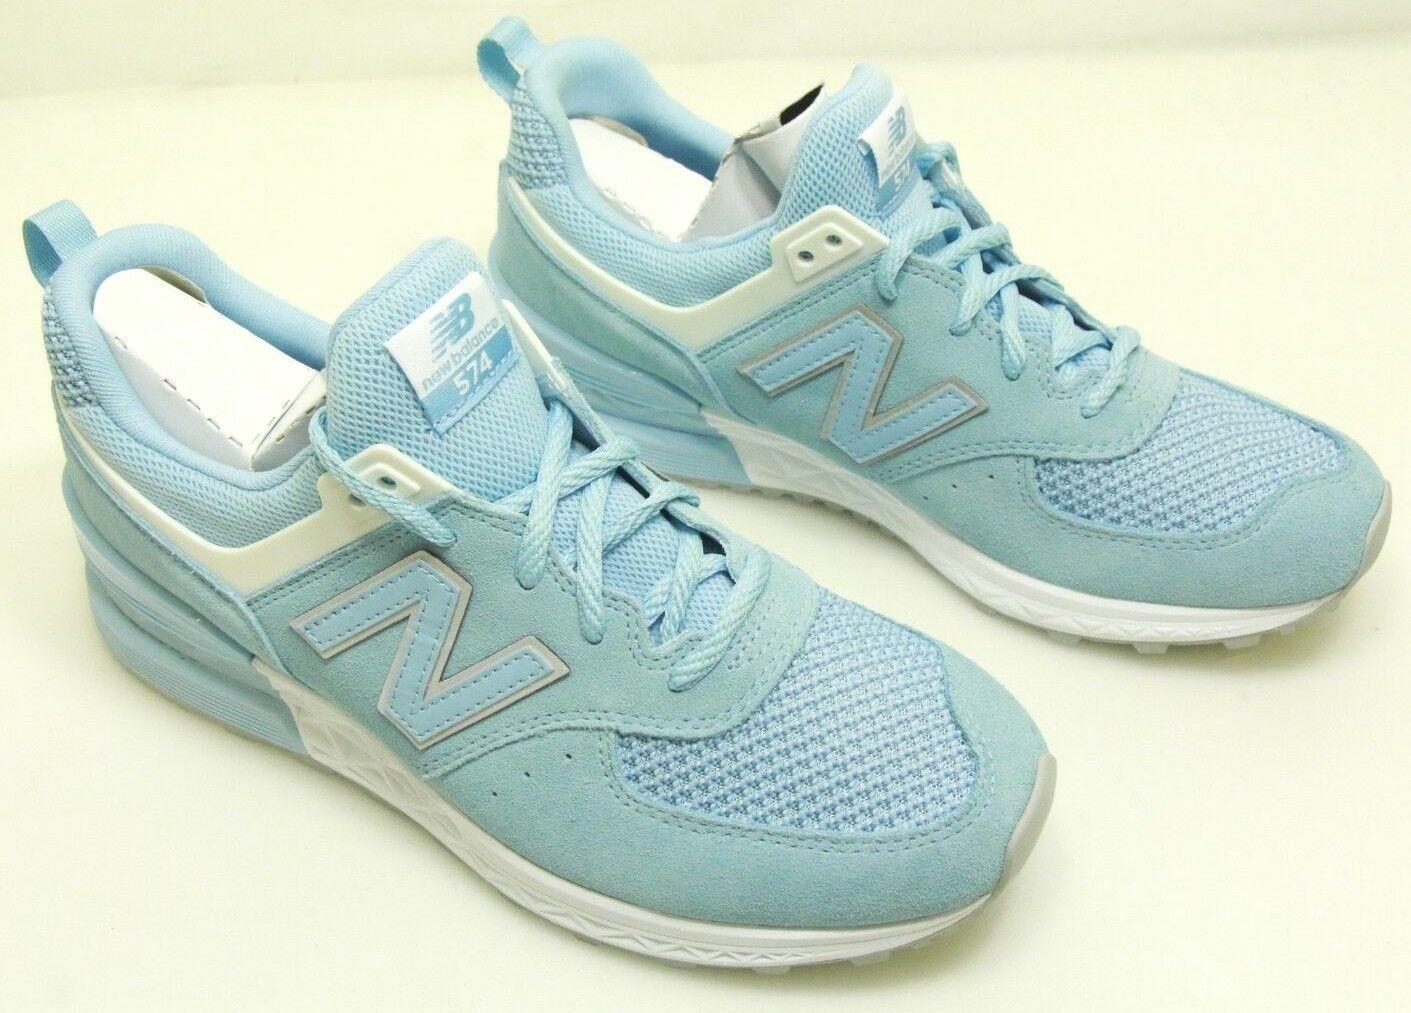 New Balance 574 Fresh Foam Sport Running schuhe Blau MS574STB Größe 9US   42.5EUR